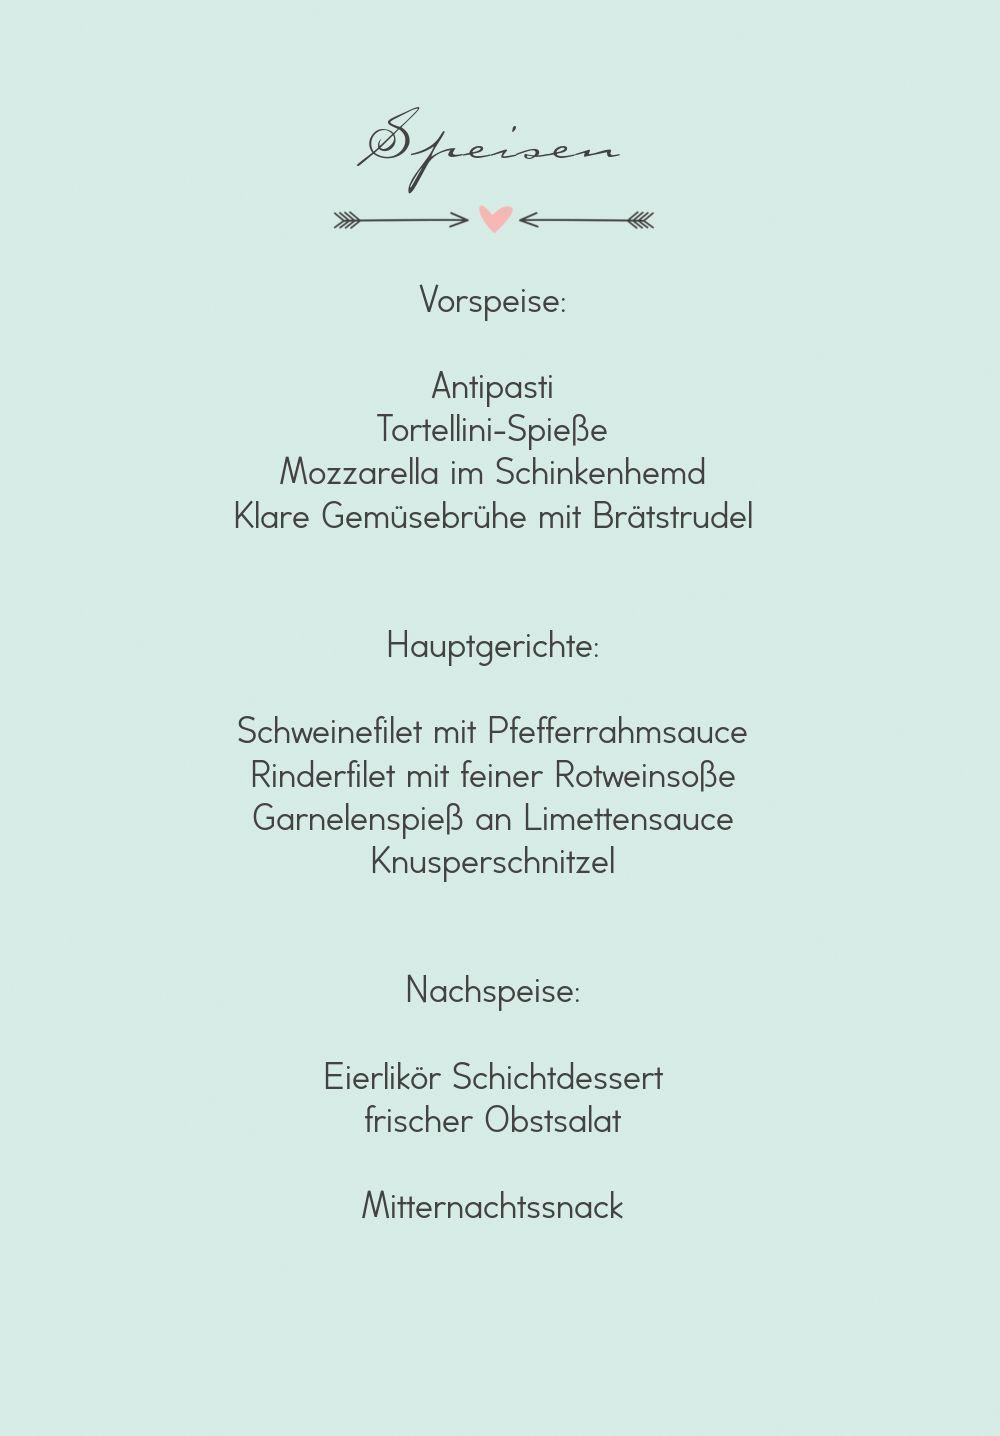 Ansicht 5 - Hochzeit Menükarte Pärchen - Männer